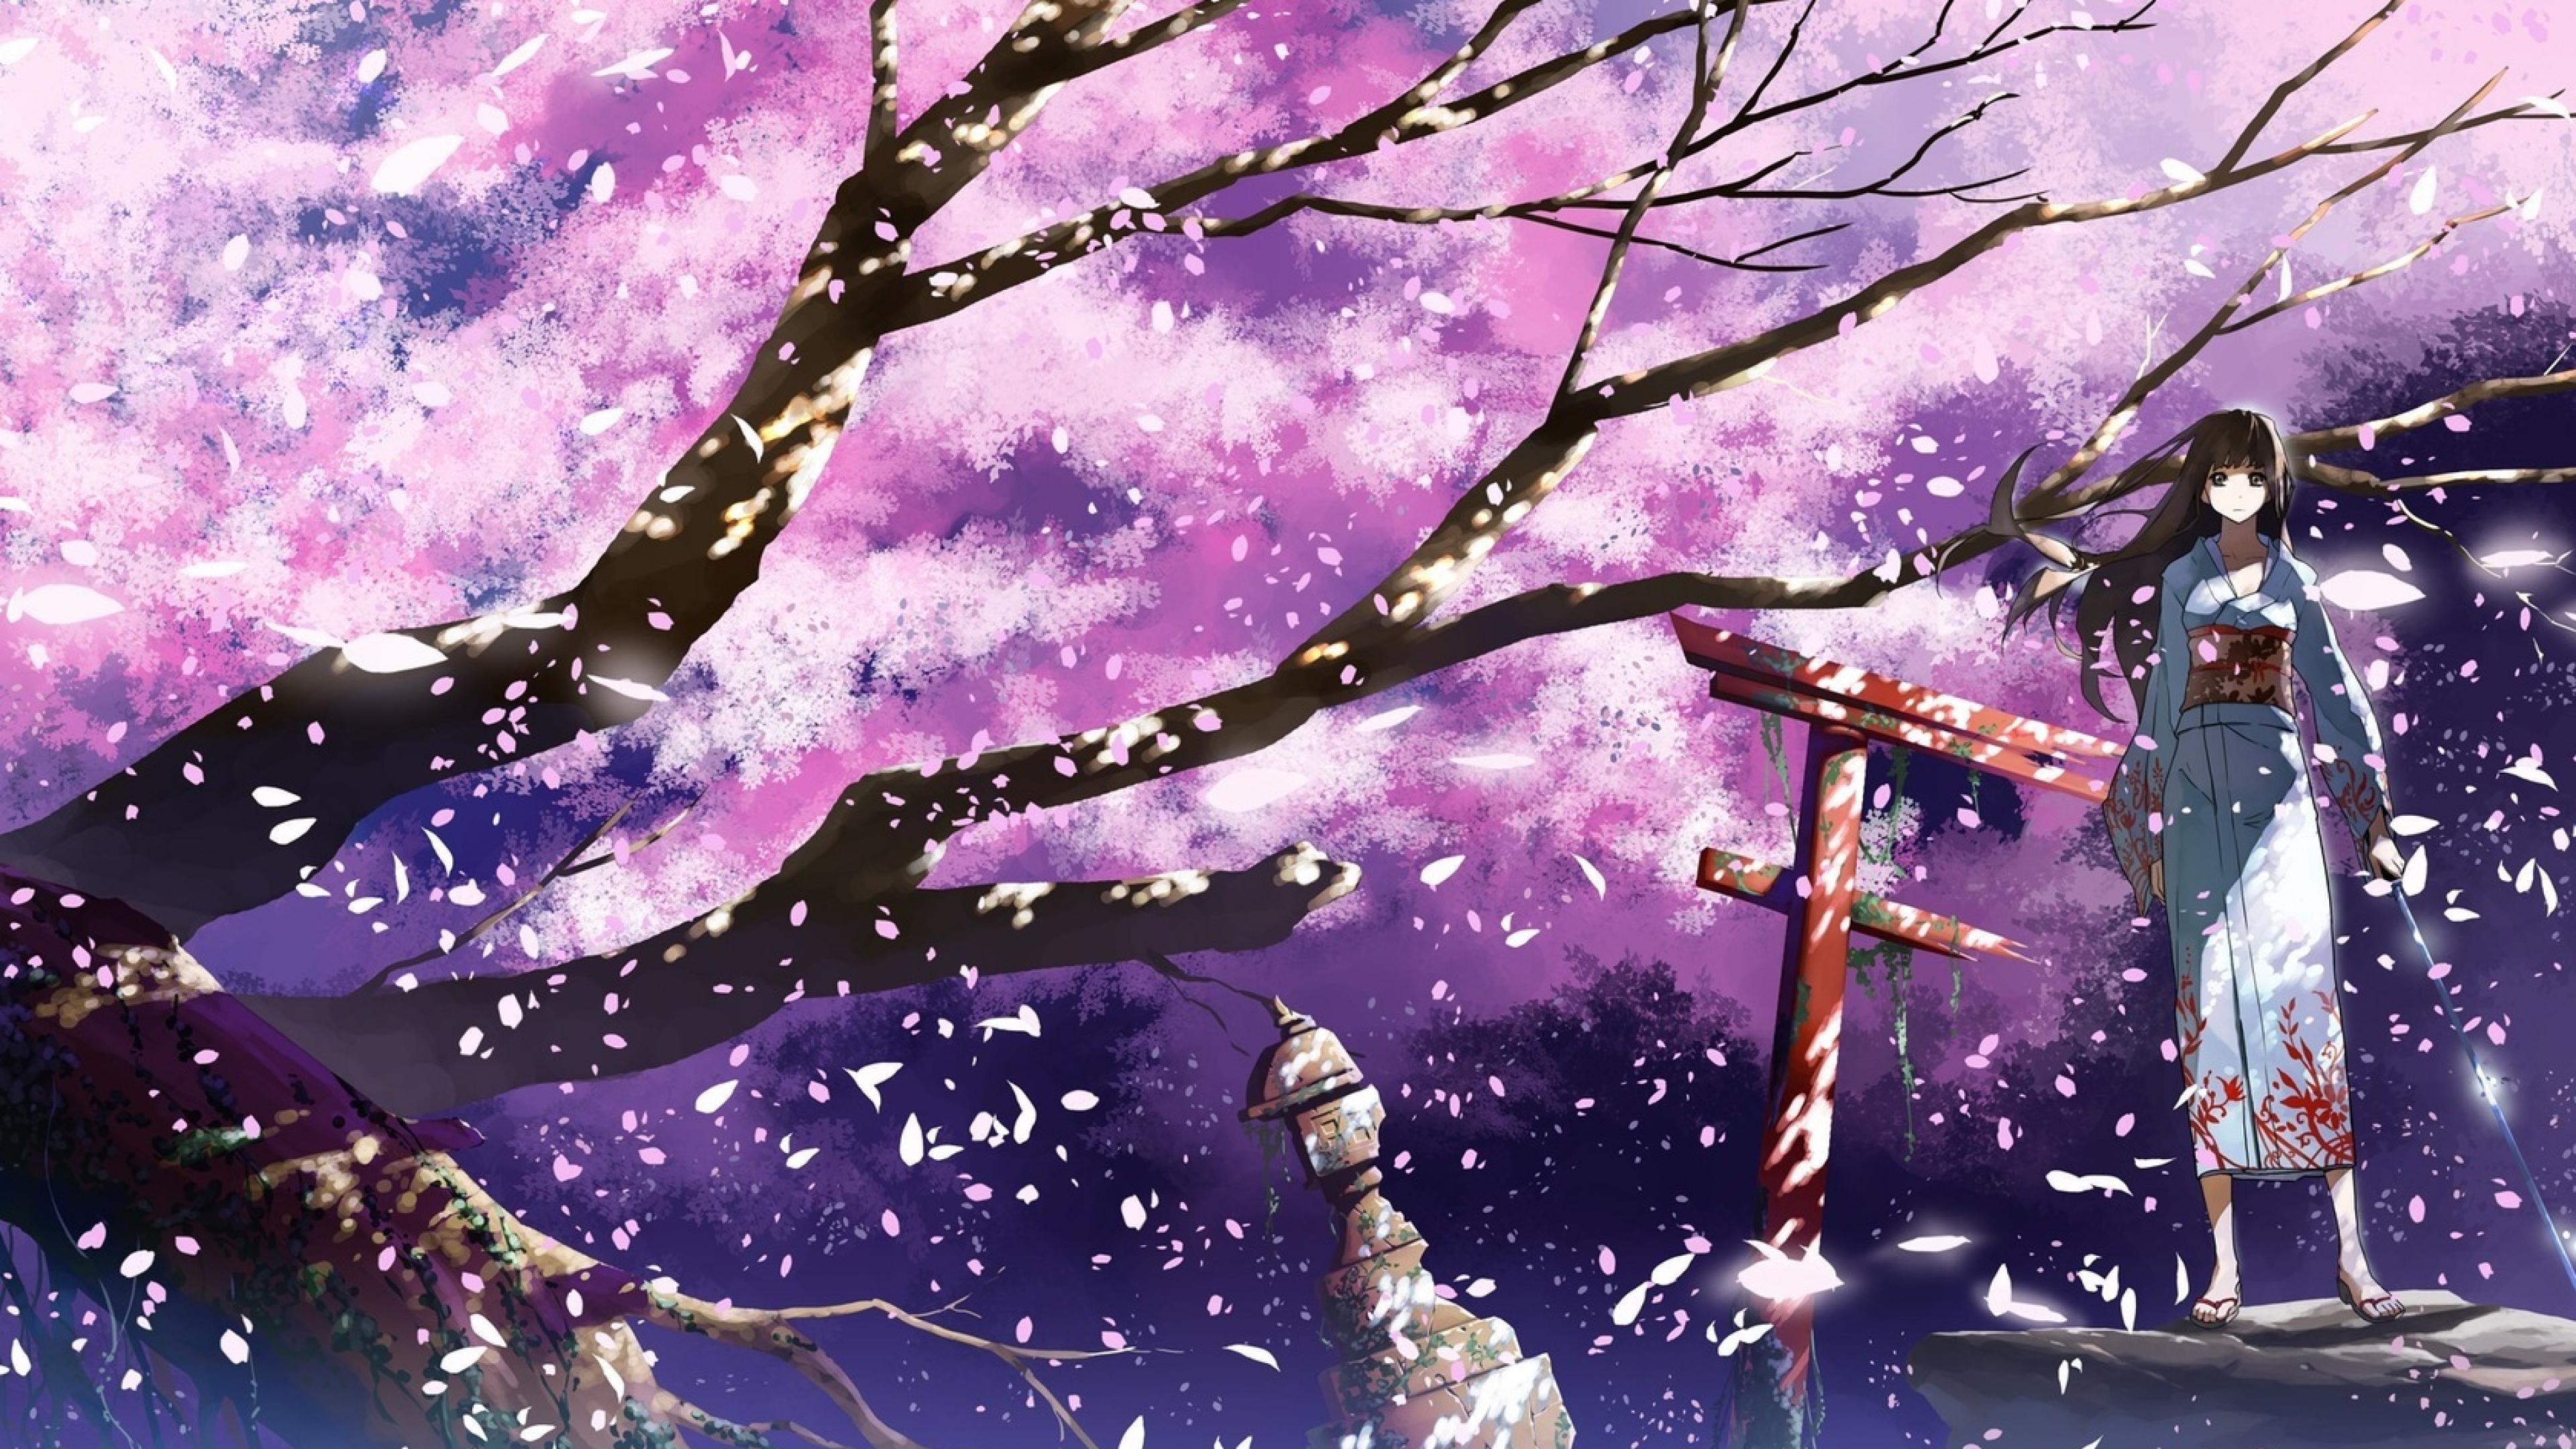 kimono sakura anime tree background desktop wallpapers nexus samsung galaxy